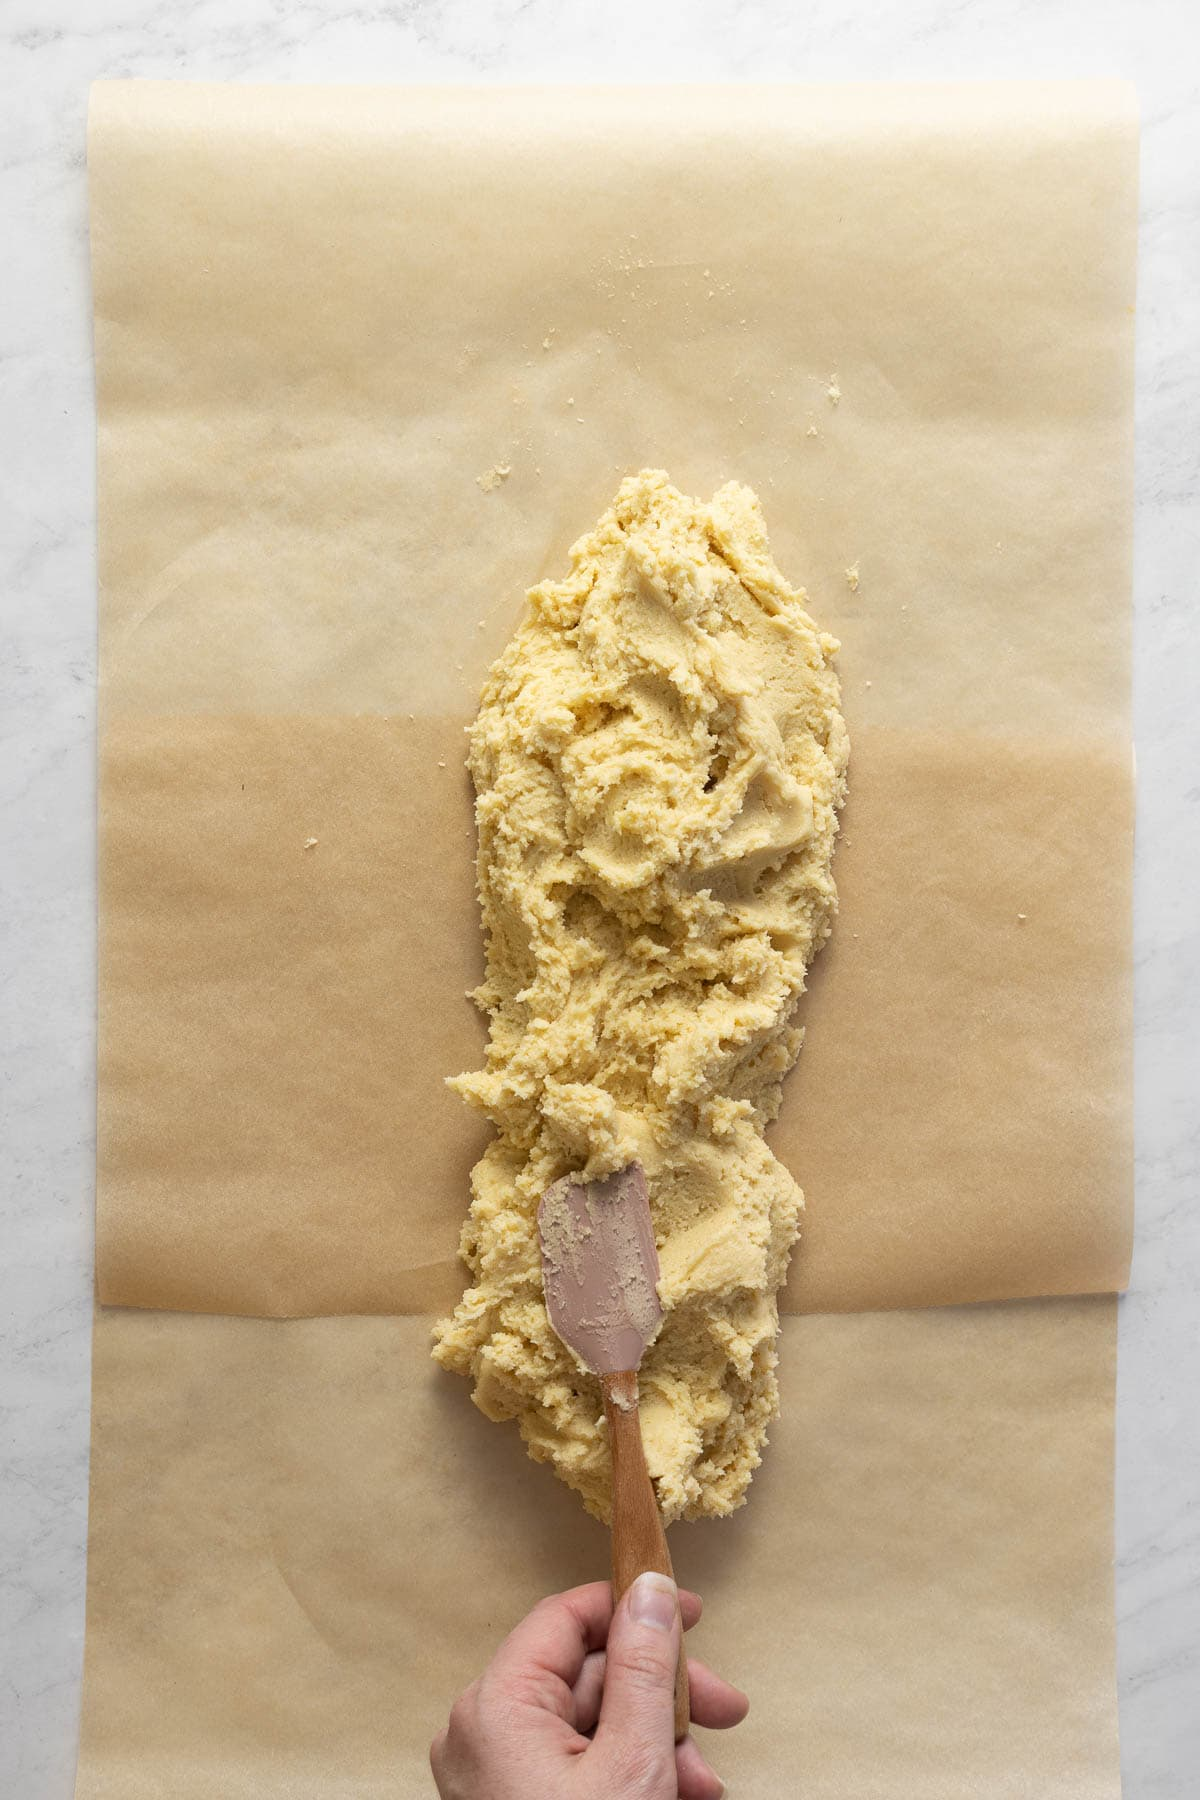 Chai Snickerdoodle cookie dough on parchment